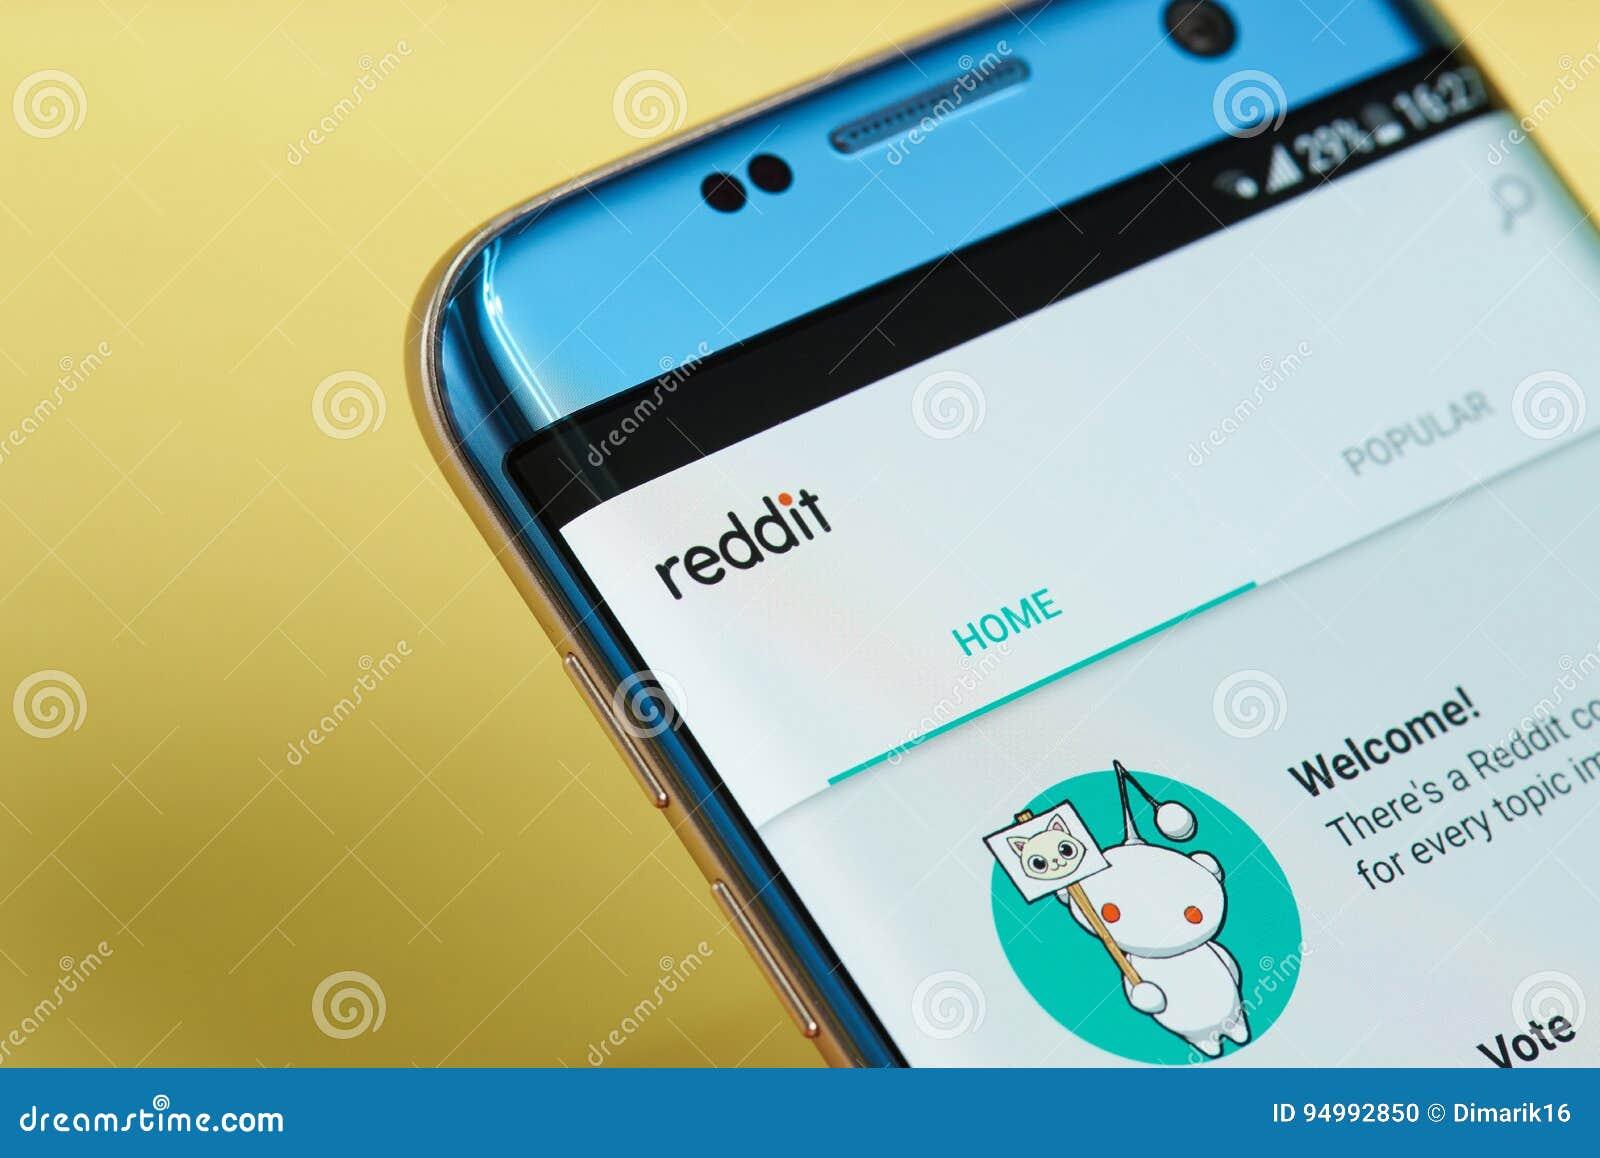 Reddit application menu editorial image  Image of device